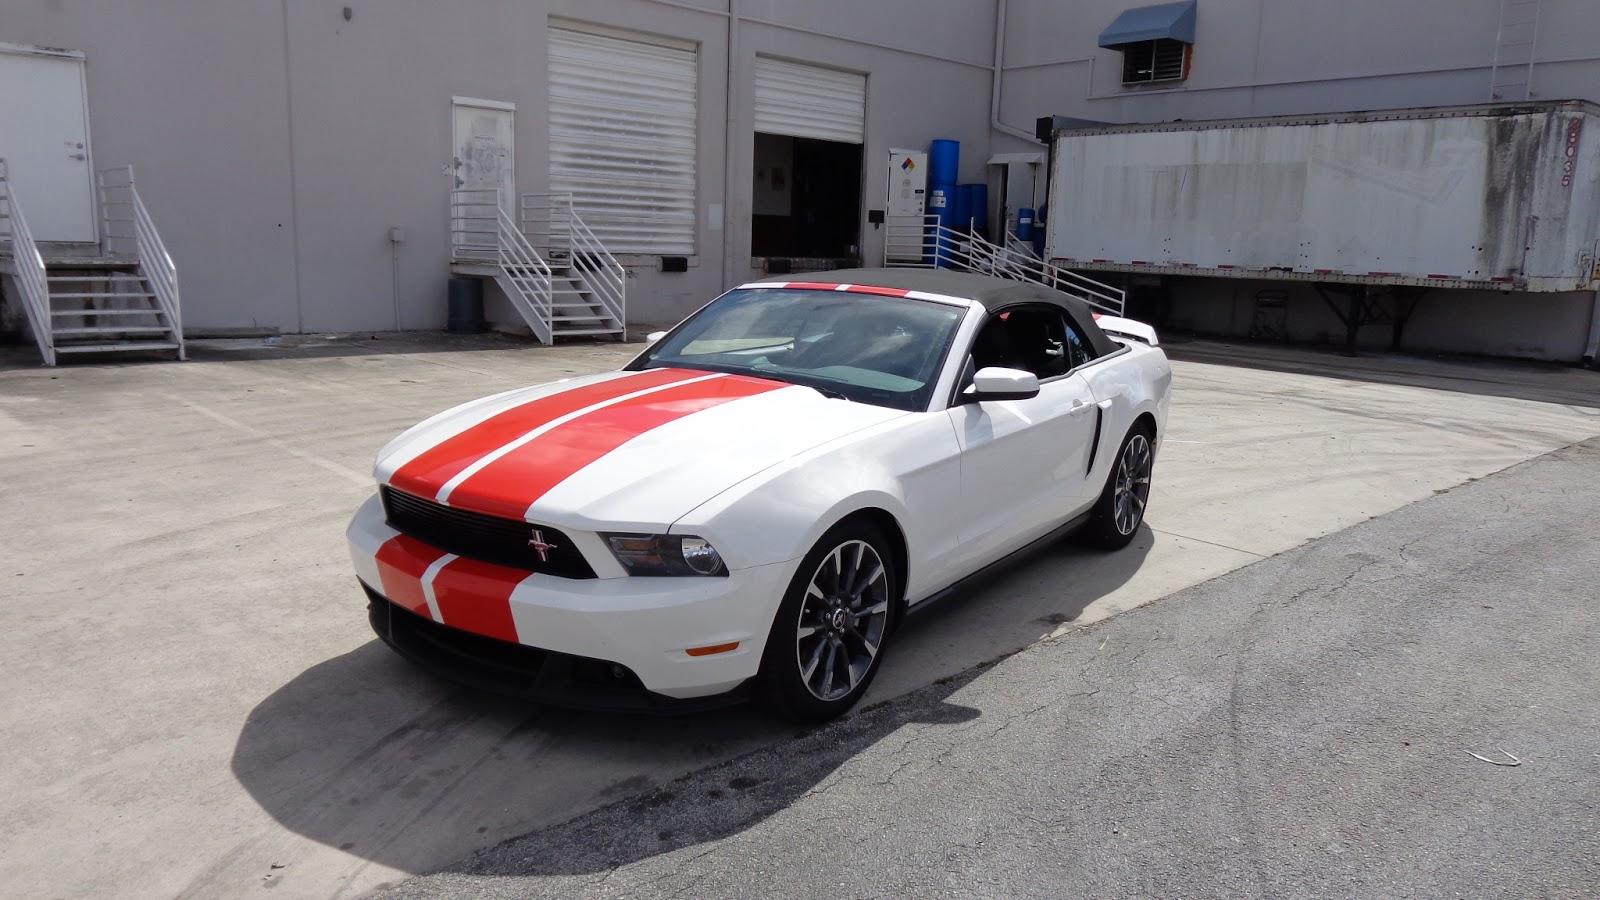 Mustang Racing Stripes Fort Lauderdale Florida